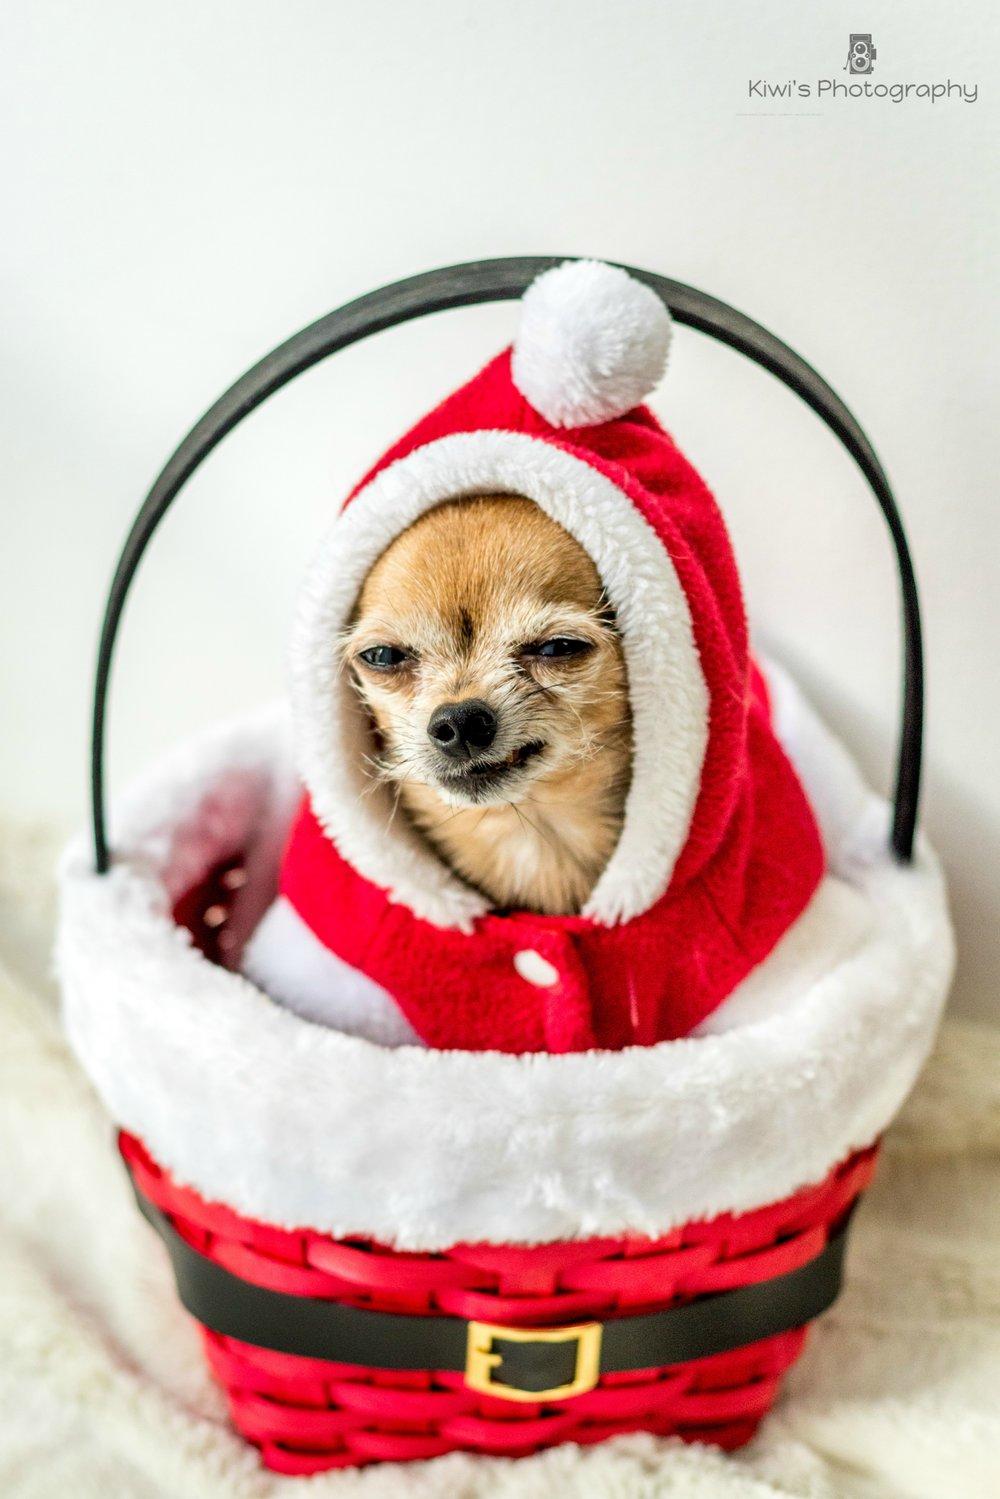 Christmas chorkie, smiling chihuahua, Ottawa dog